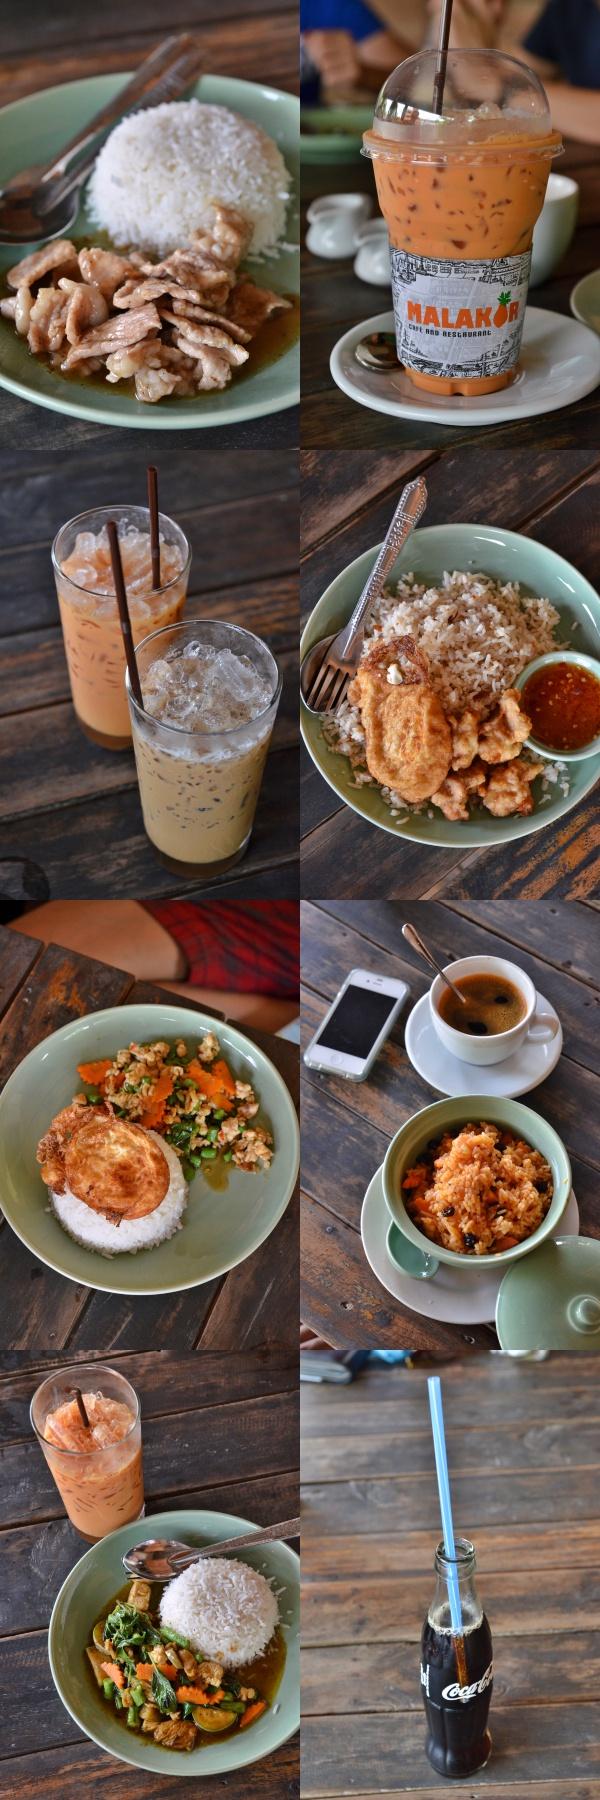 Malakor Restaurant Ayutthaya